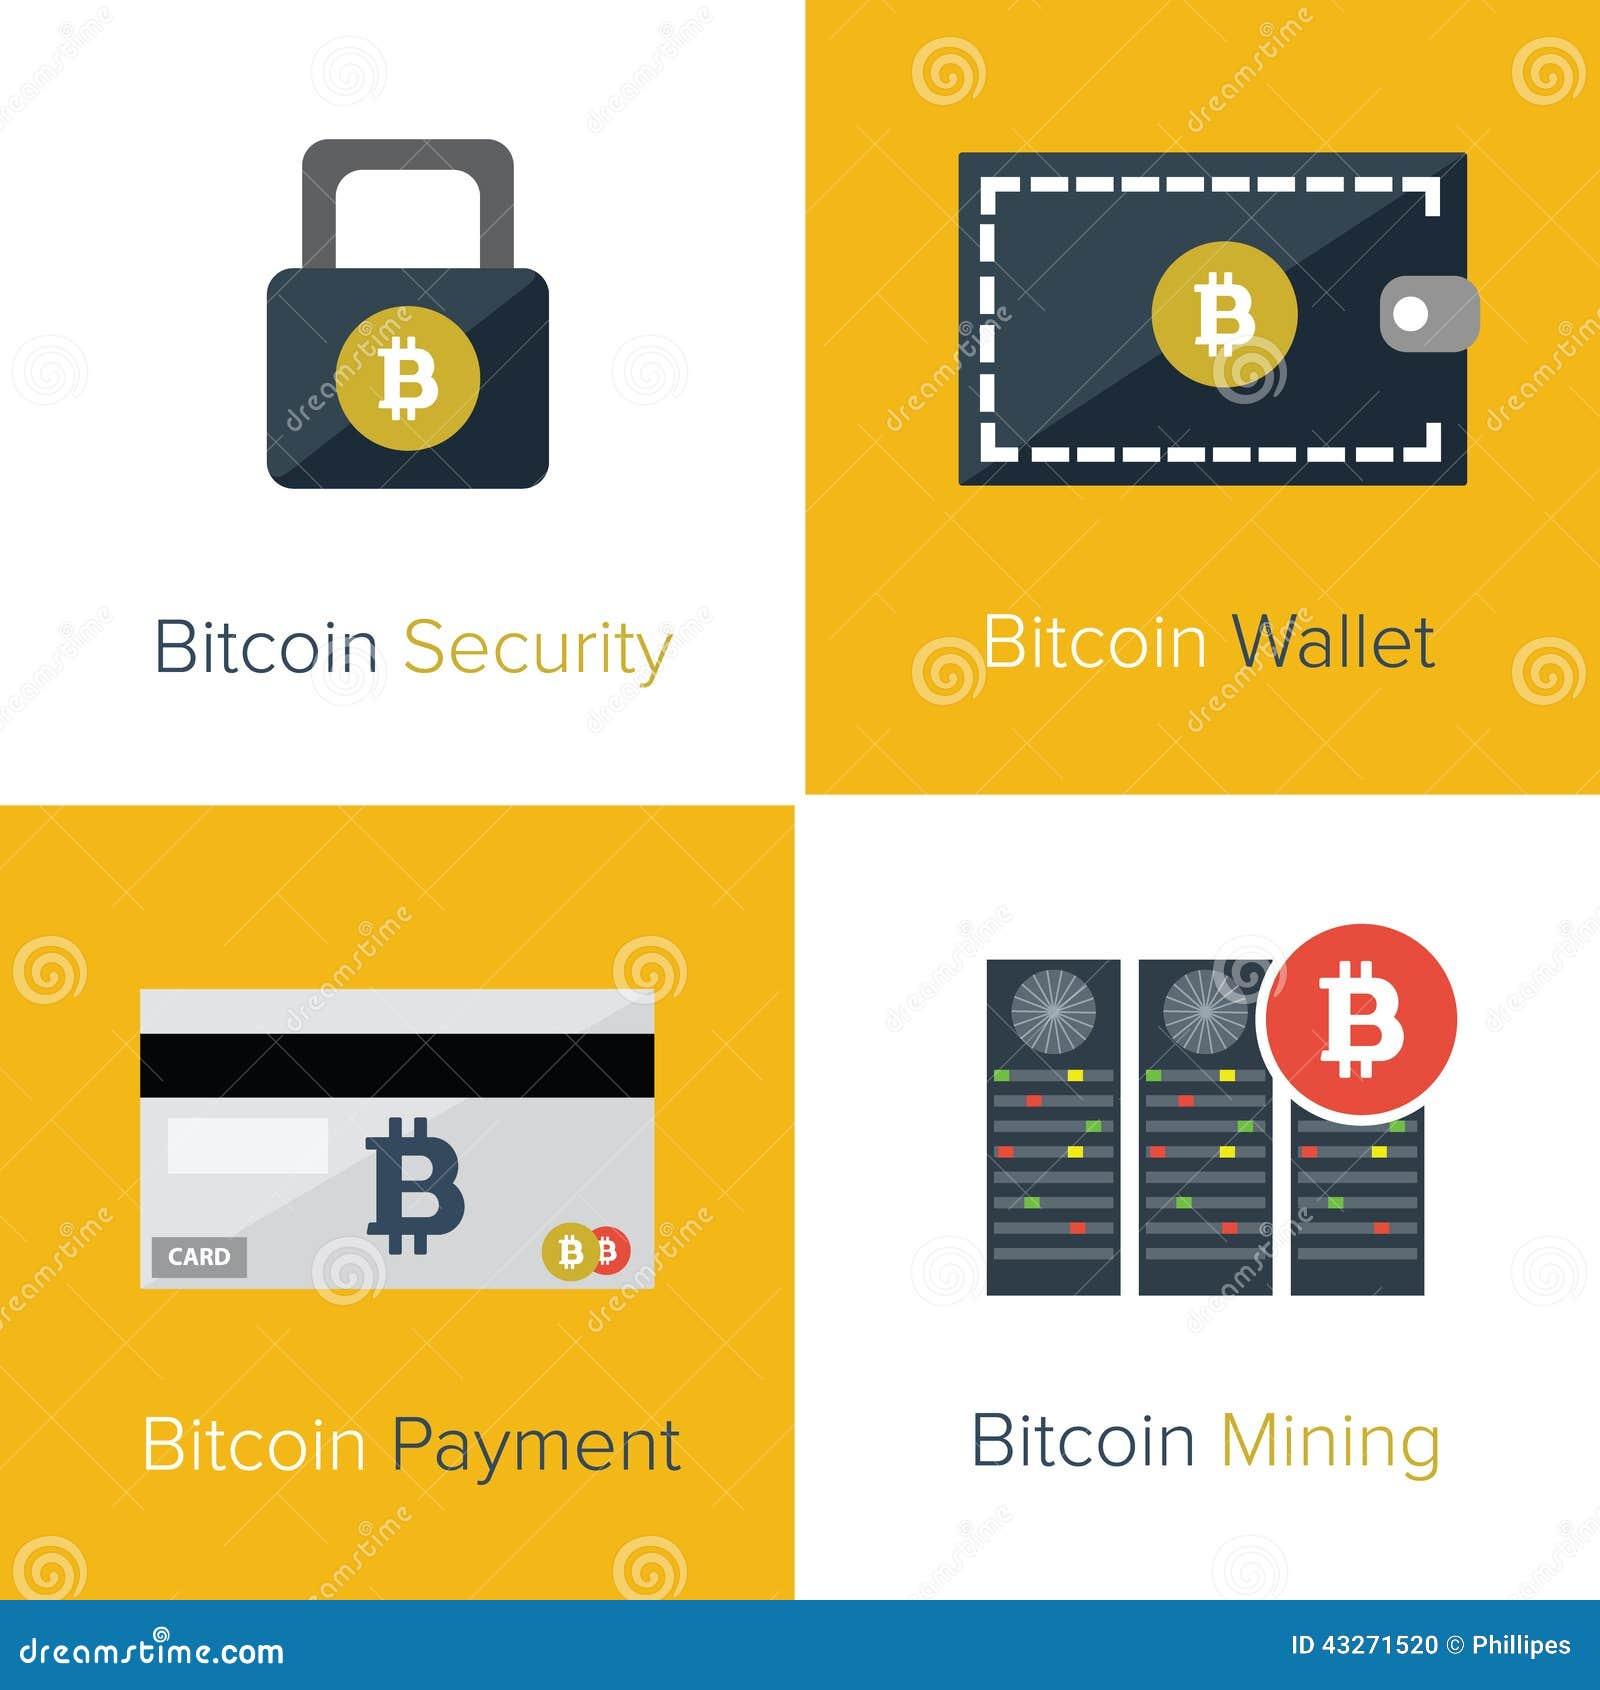 Bitcoin Mining Template Free